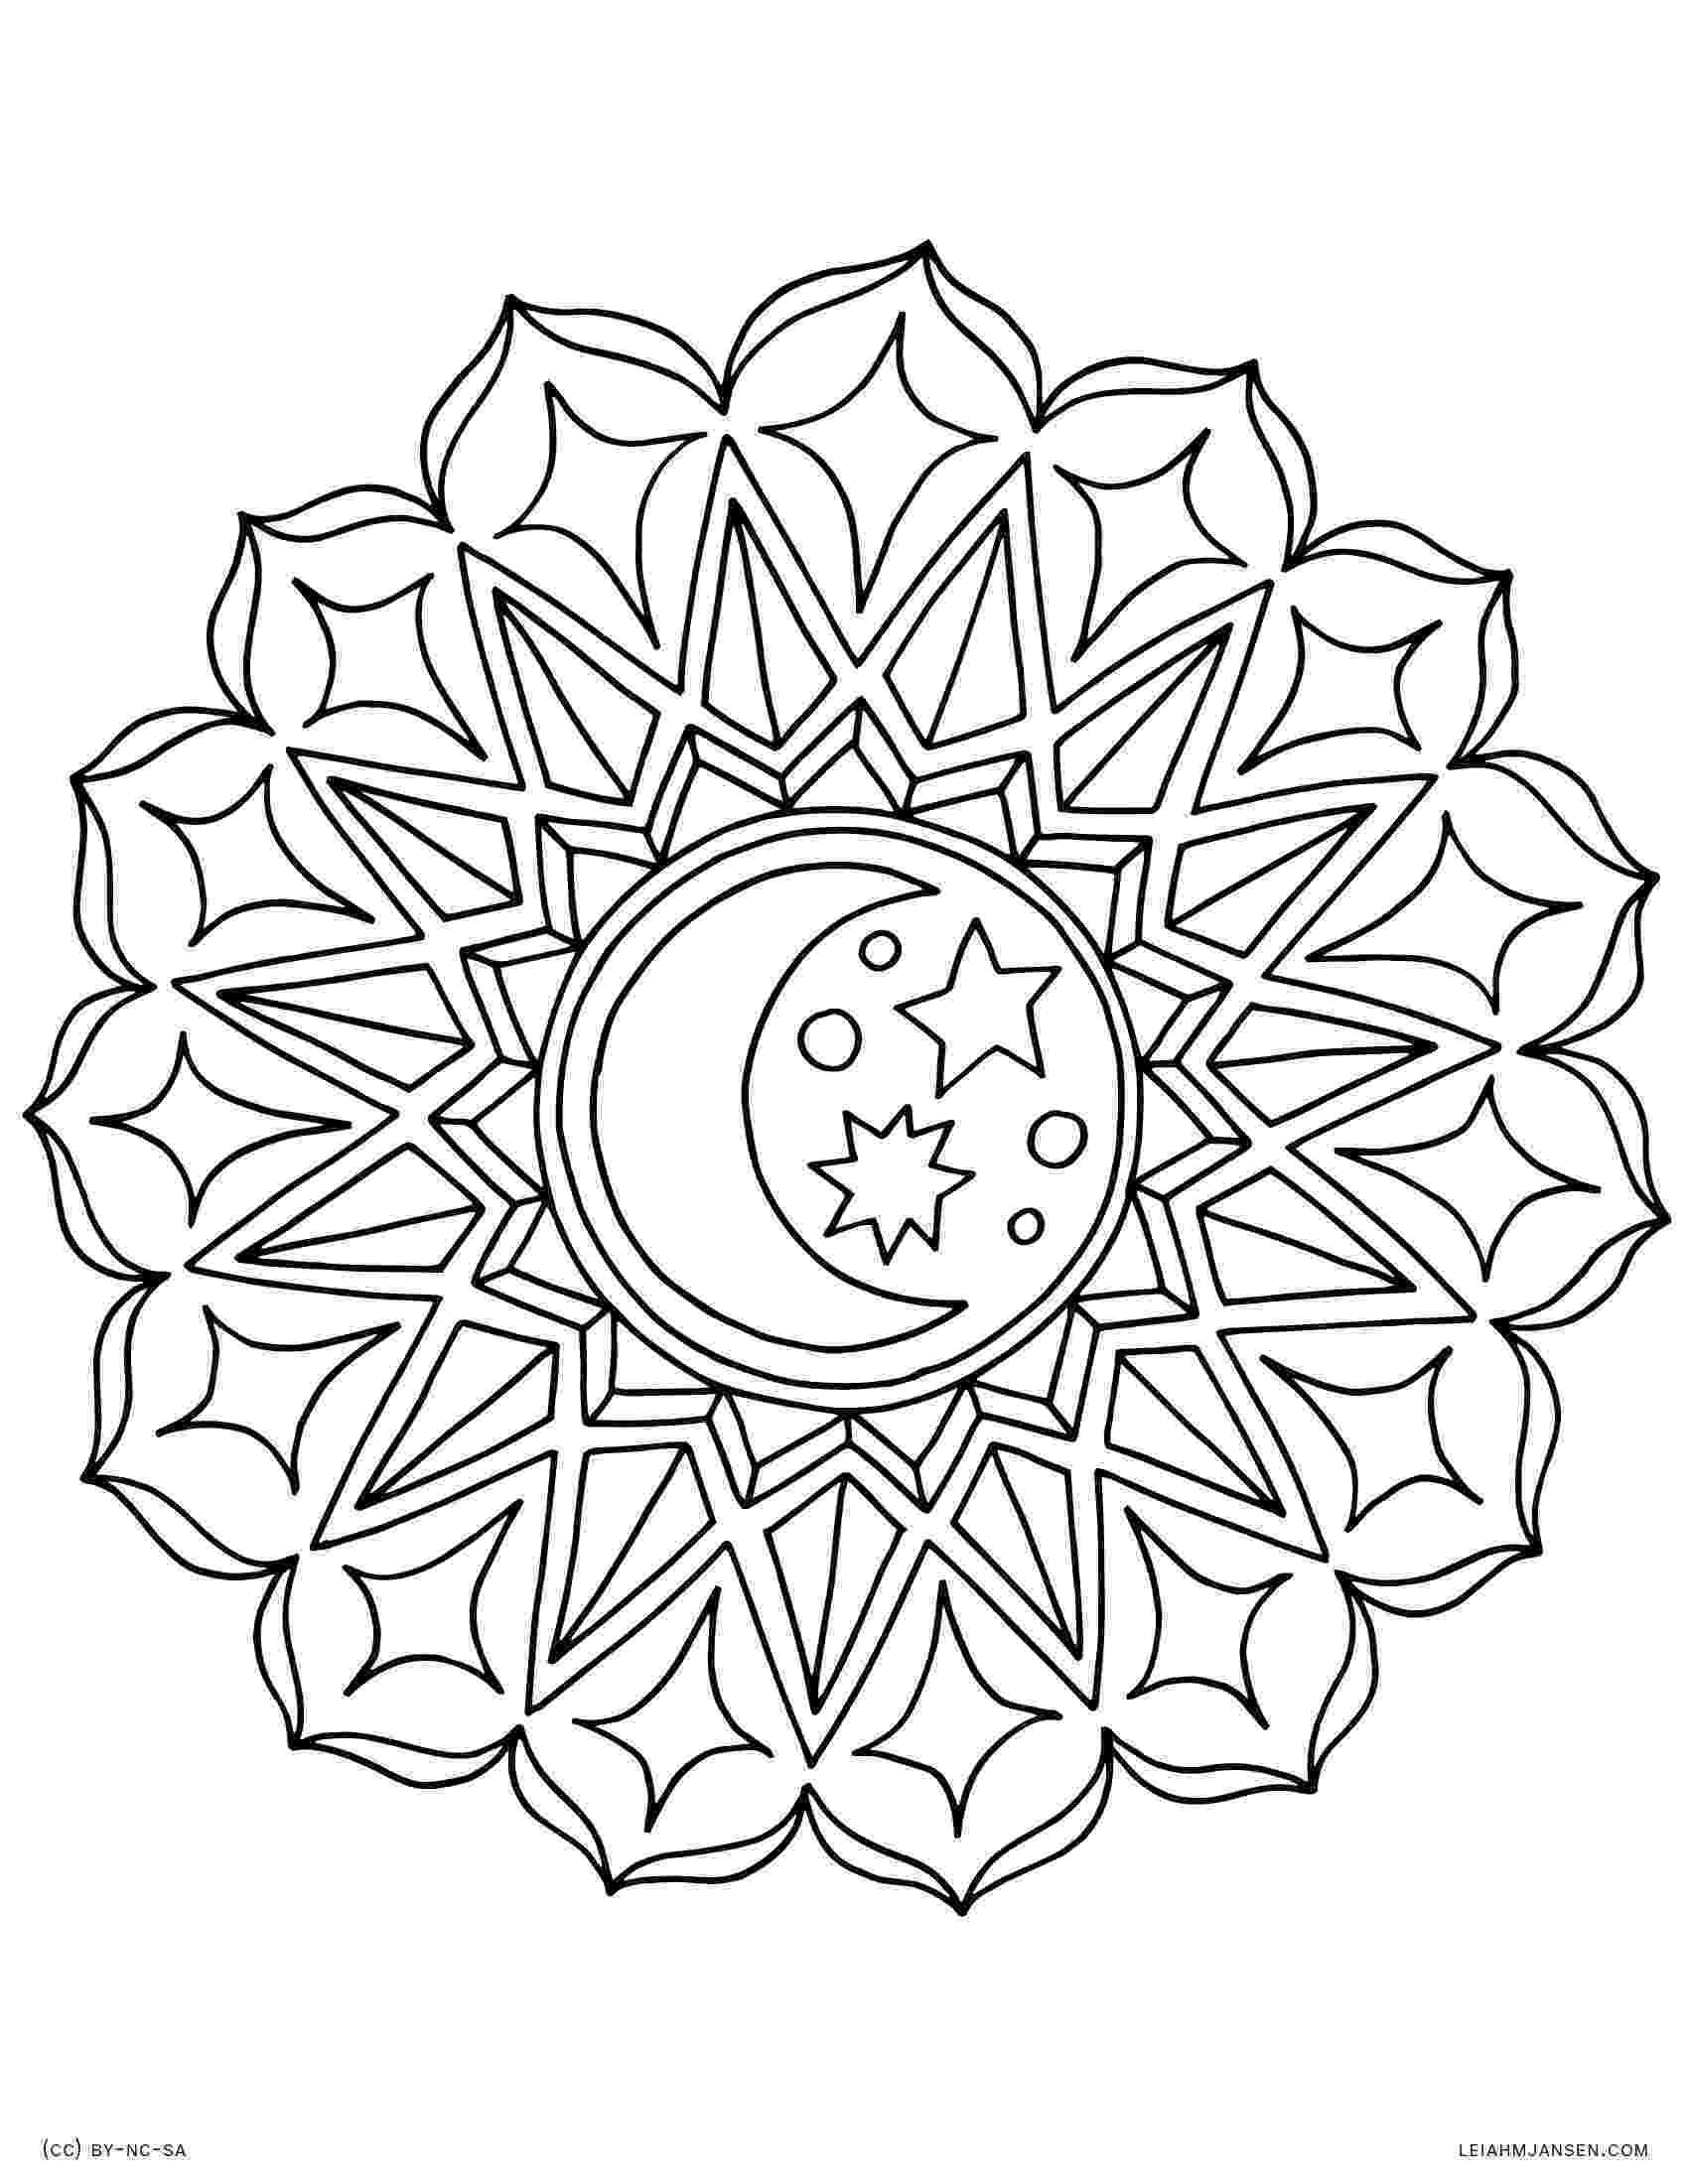 free mandala coloring pages mindful mandalas juste etre just be free coloring pages mandala